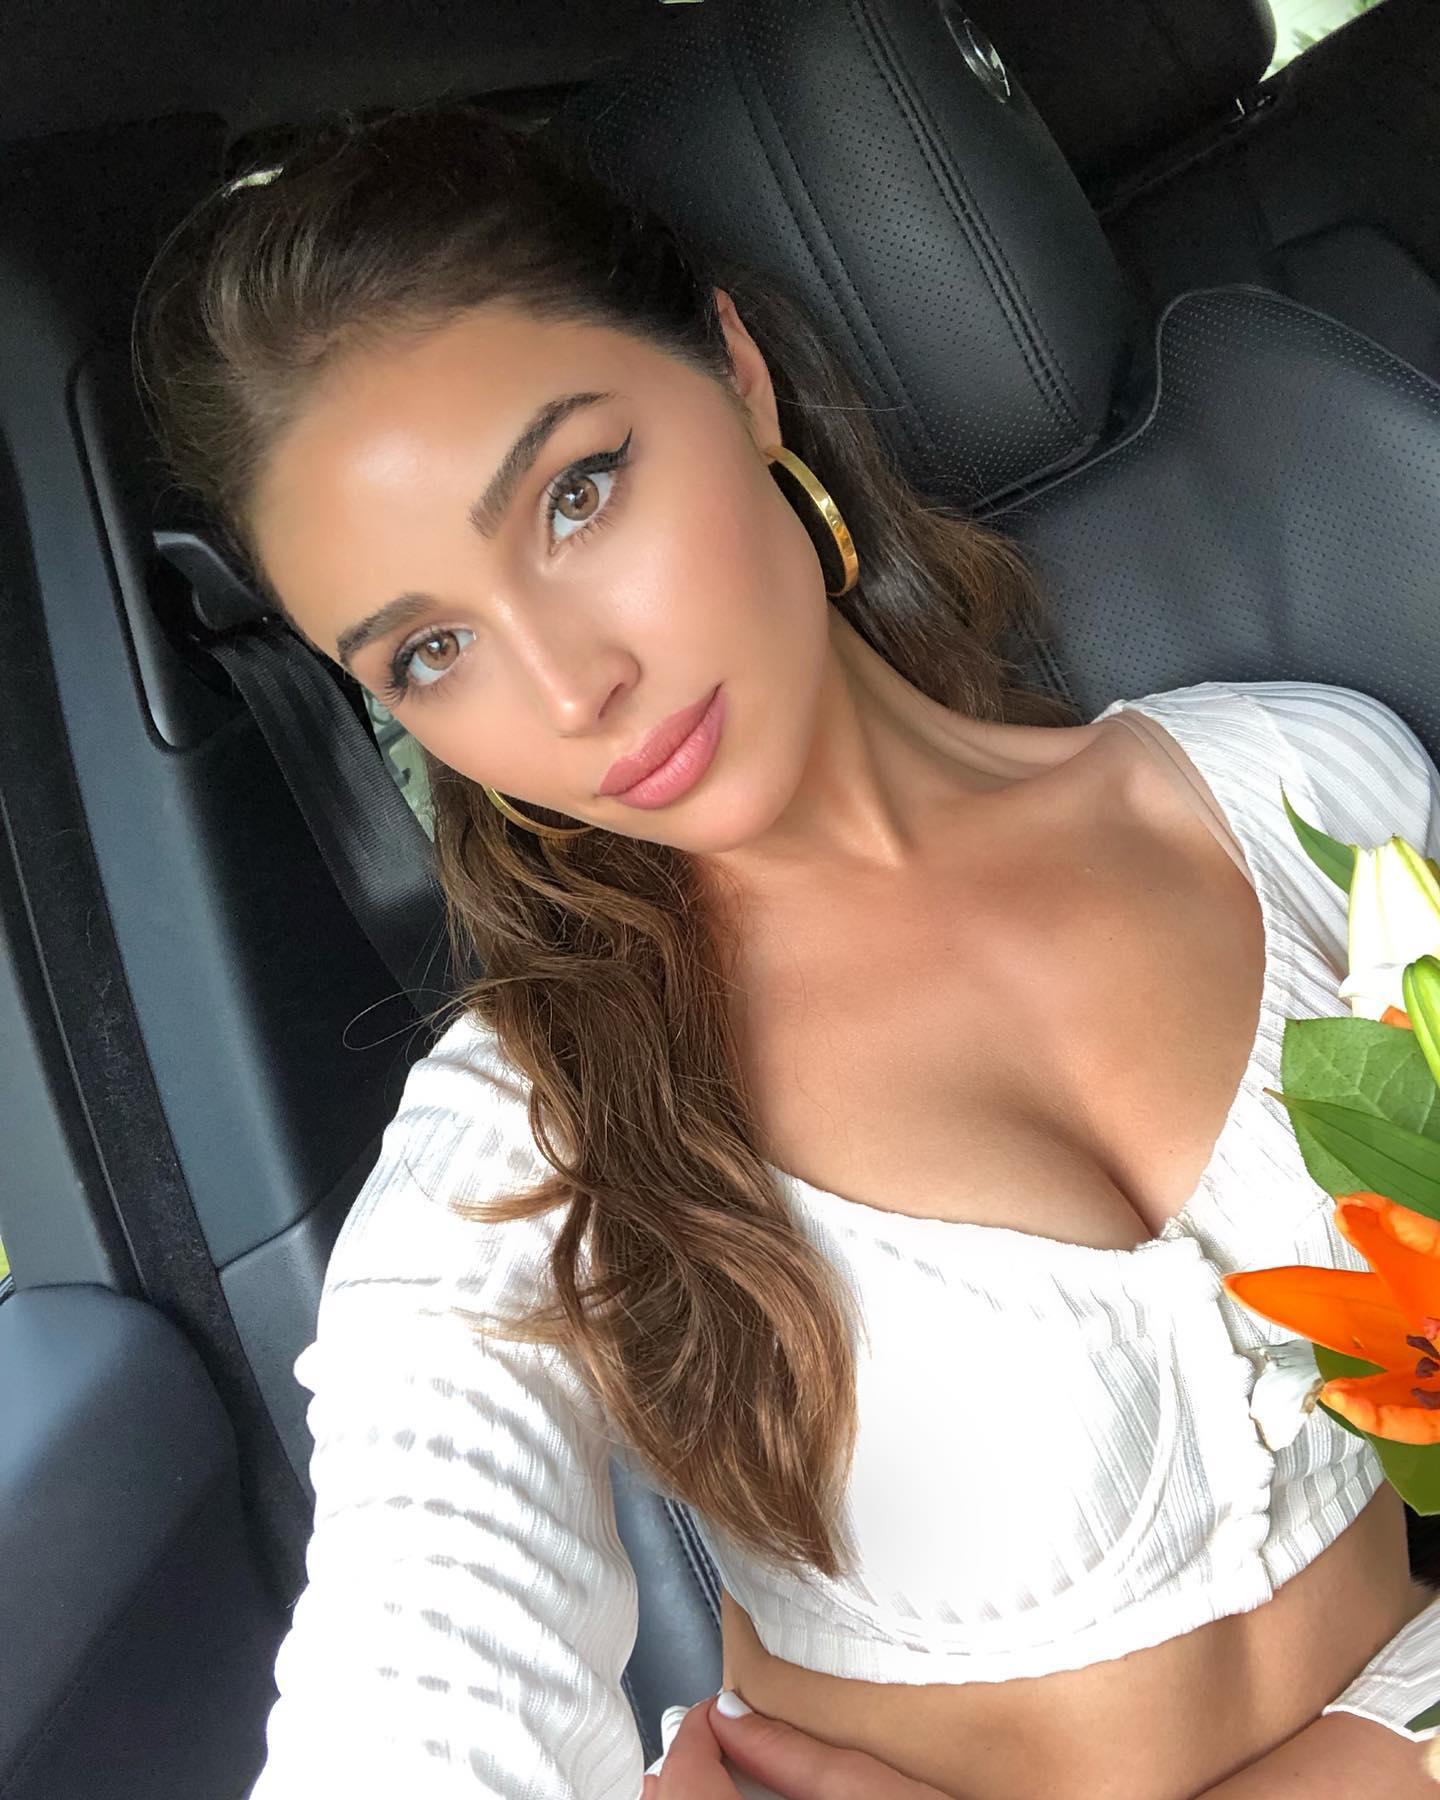 Olivia Culpo 2019 : Olivia Culpo – @oliviaculpo personal photos-25